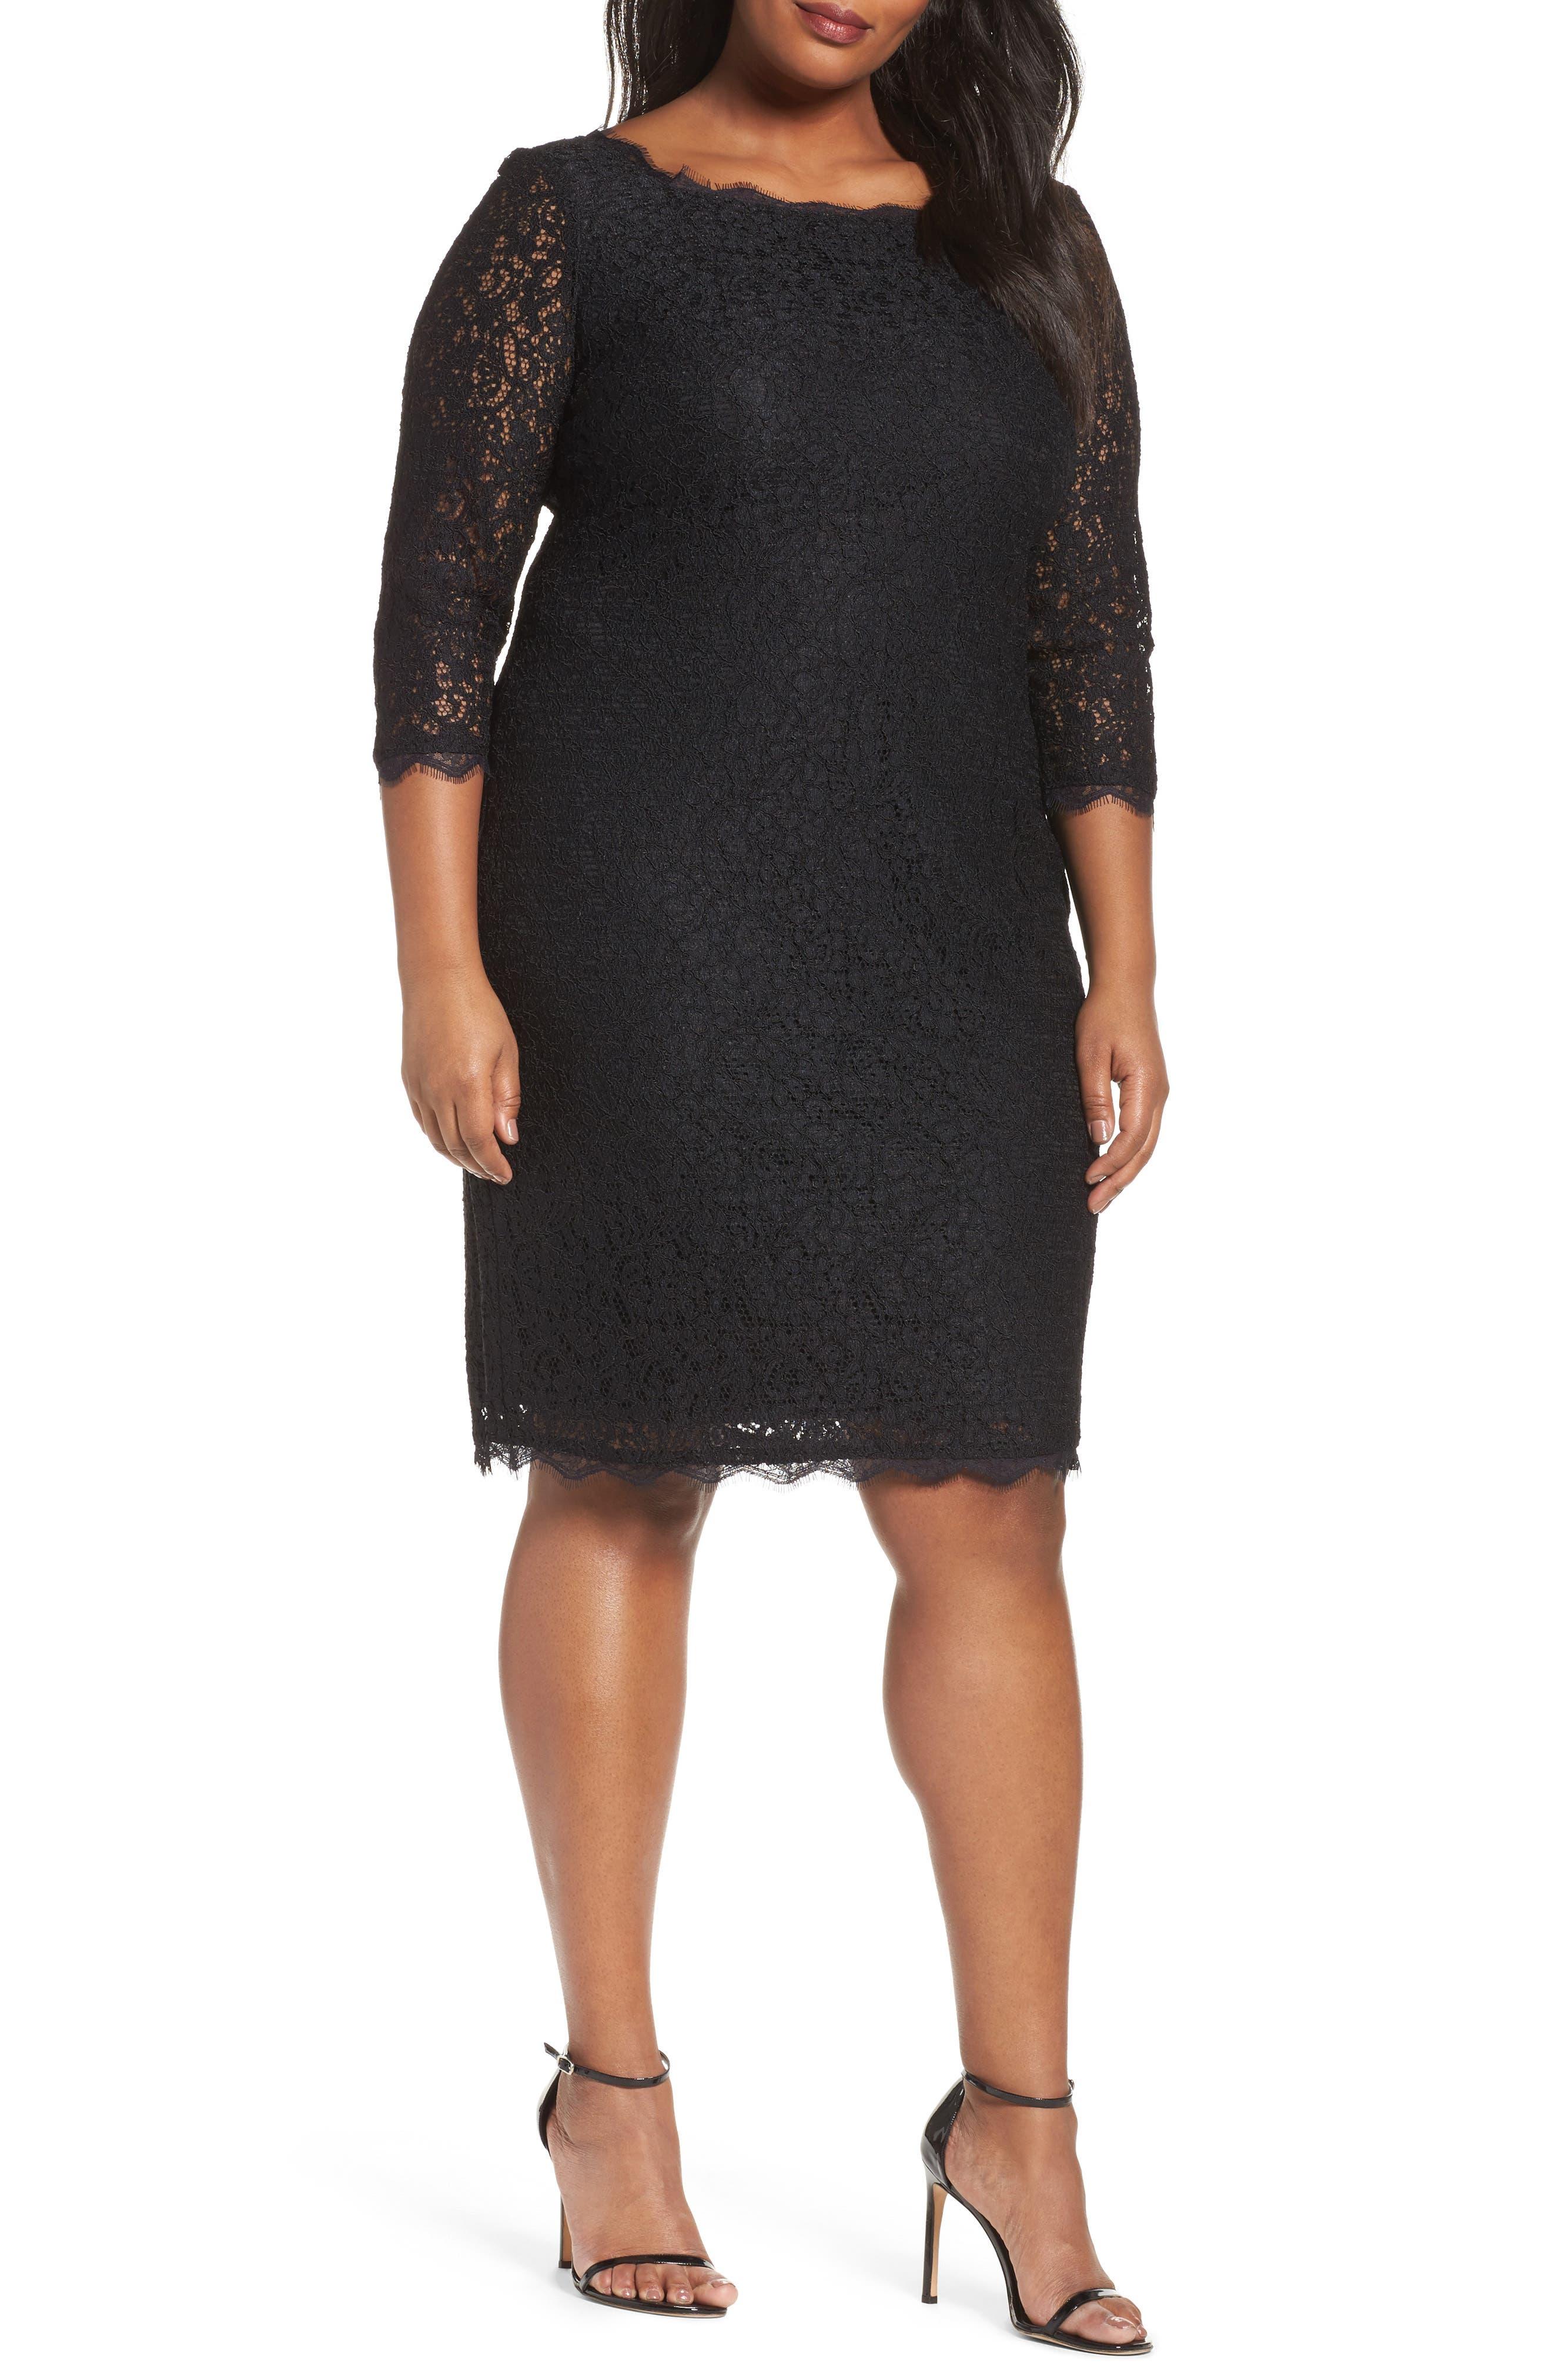 Plus Size Adrianna Papell Lace Overlay Sheath Dress, Black